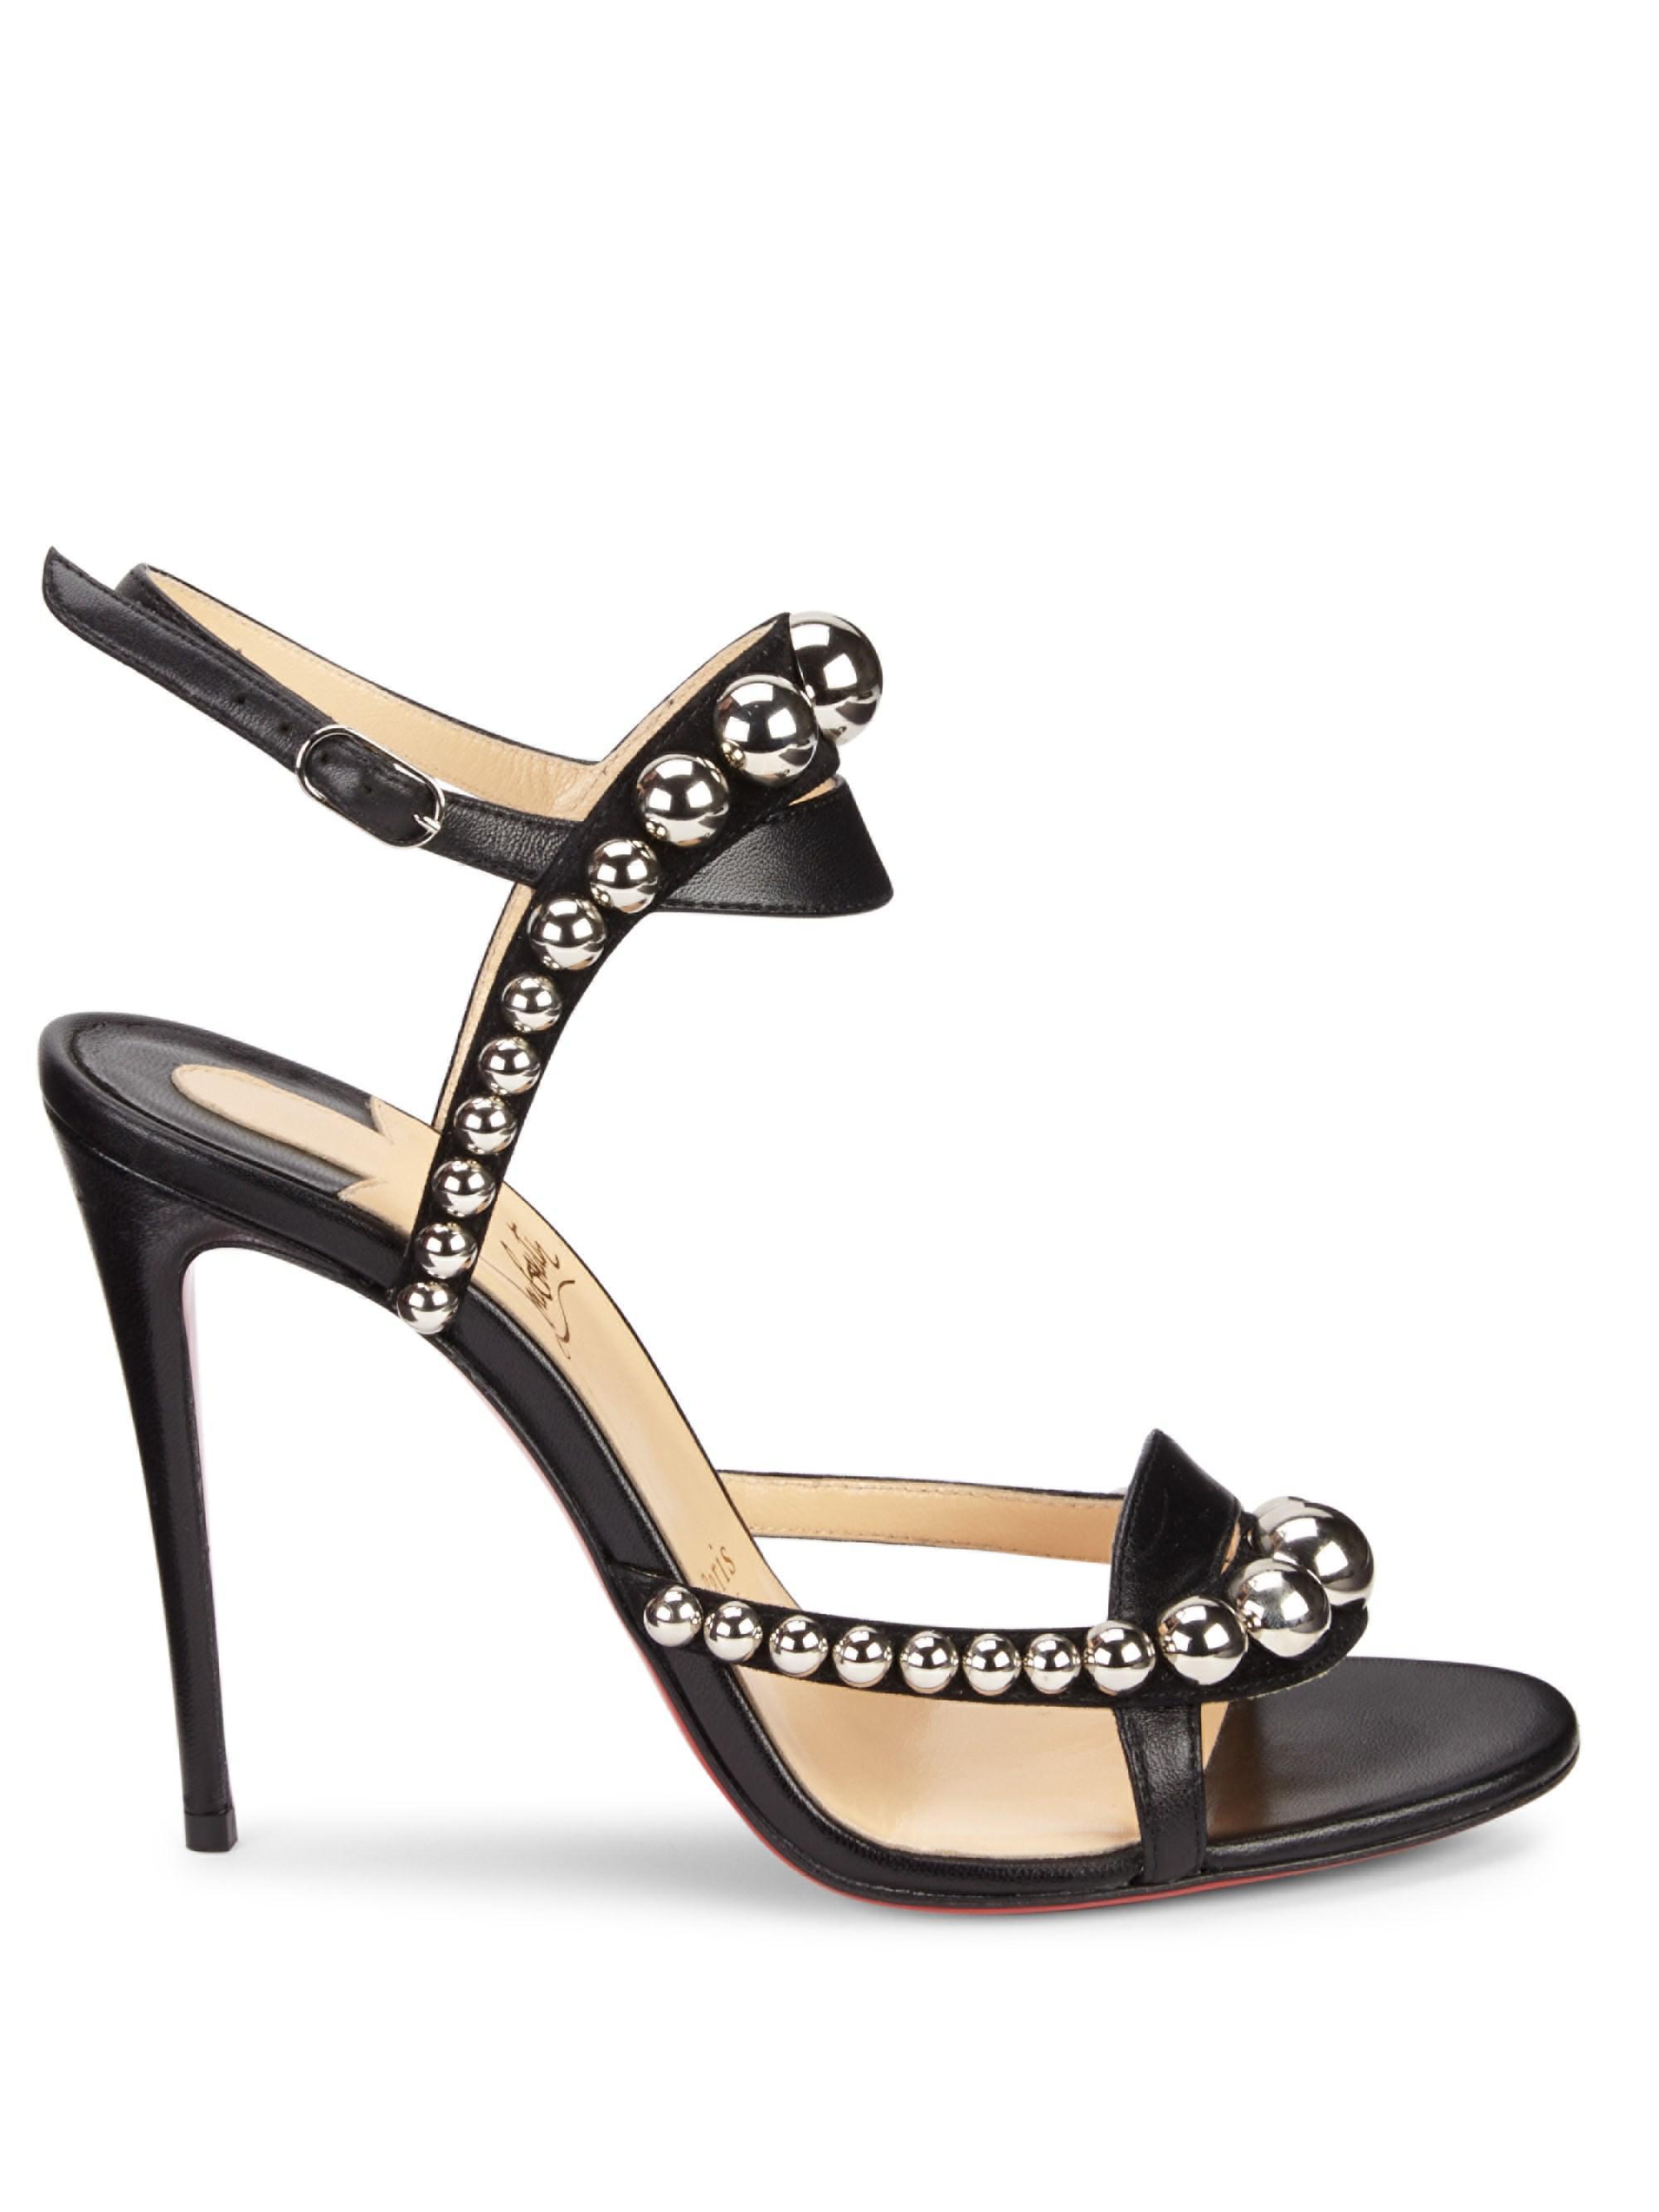 the latest c13d3 e5c42 Christian Louboutin Black Galleria 100 Leather Stud Sandals